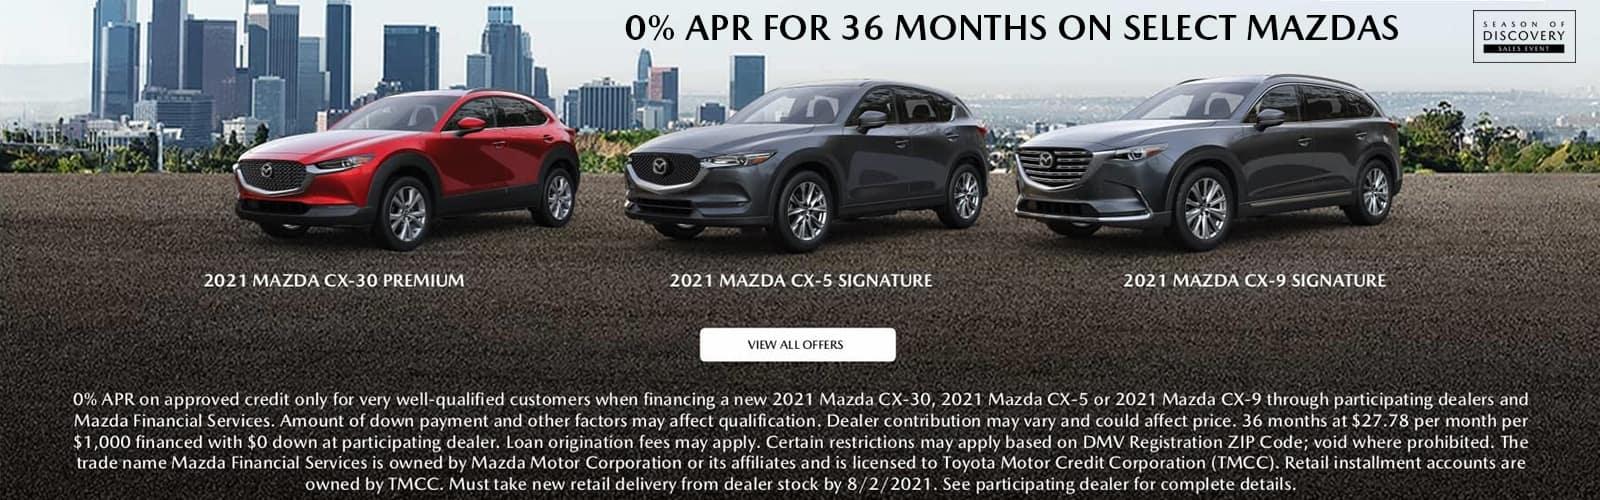 7_21_WV_Mazda_1600x500_0_percent